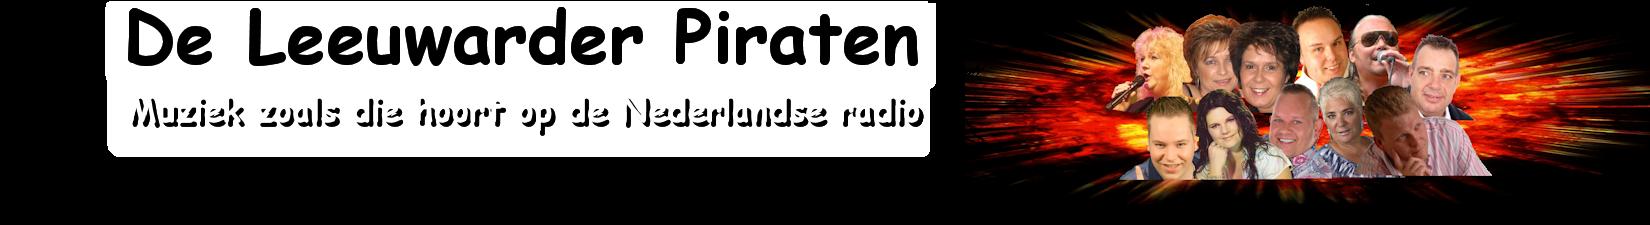 De Leeuwarder Piraten